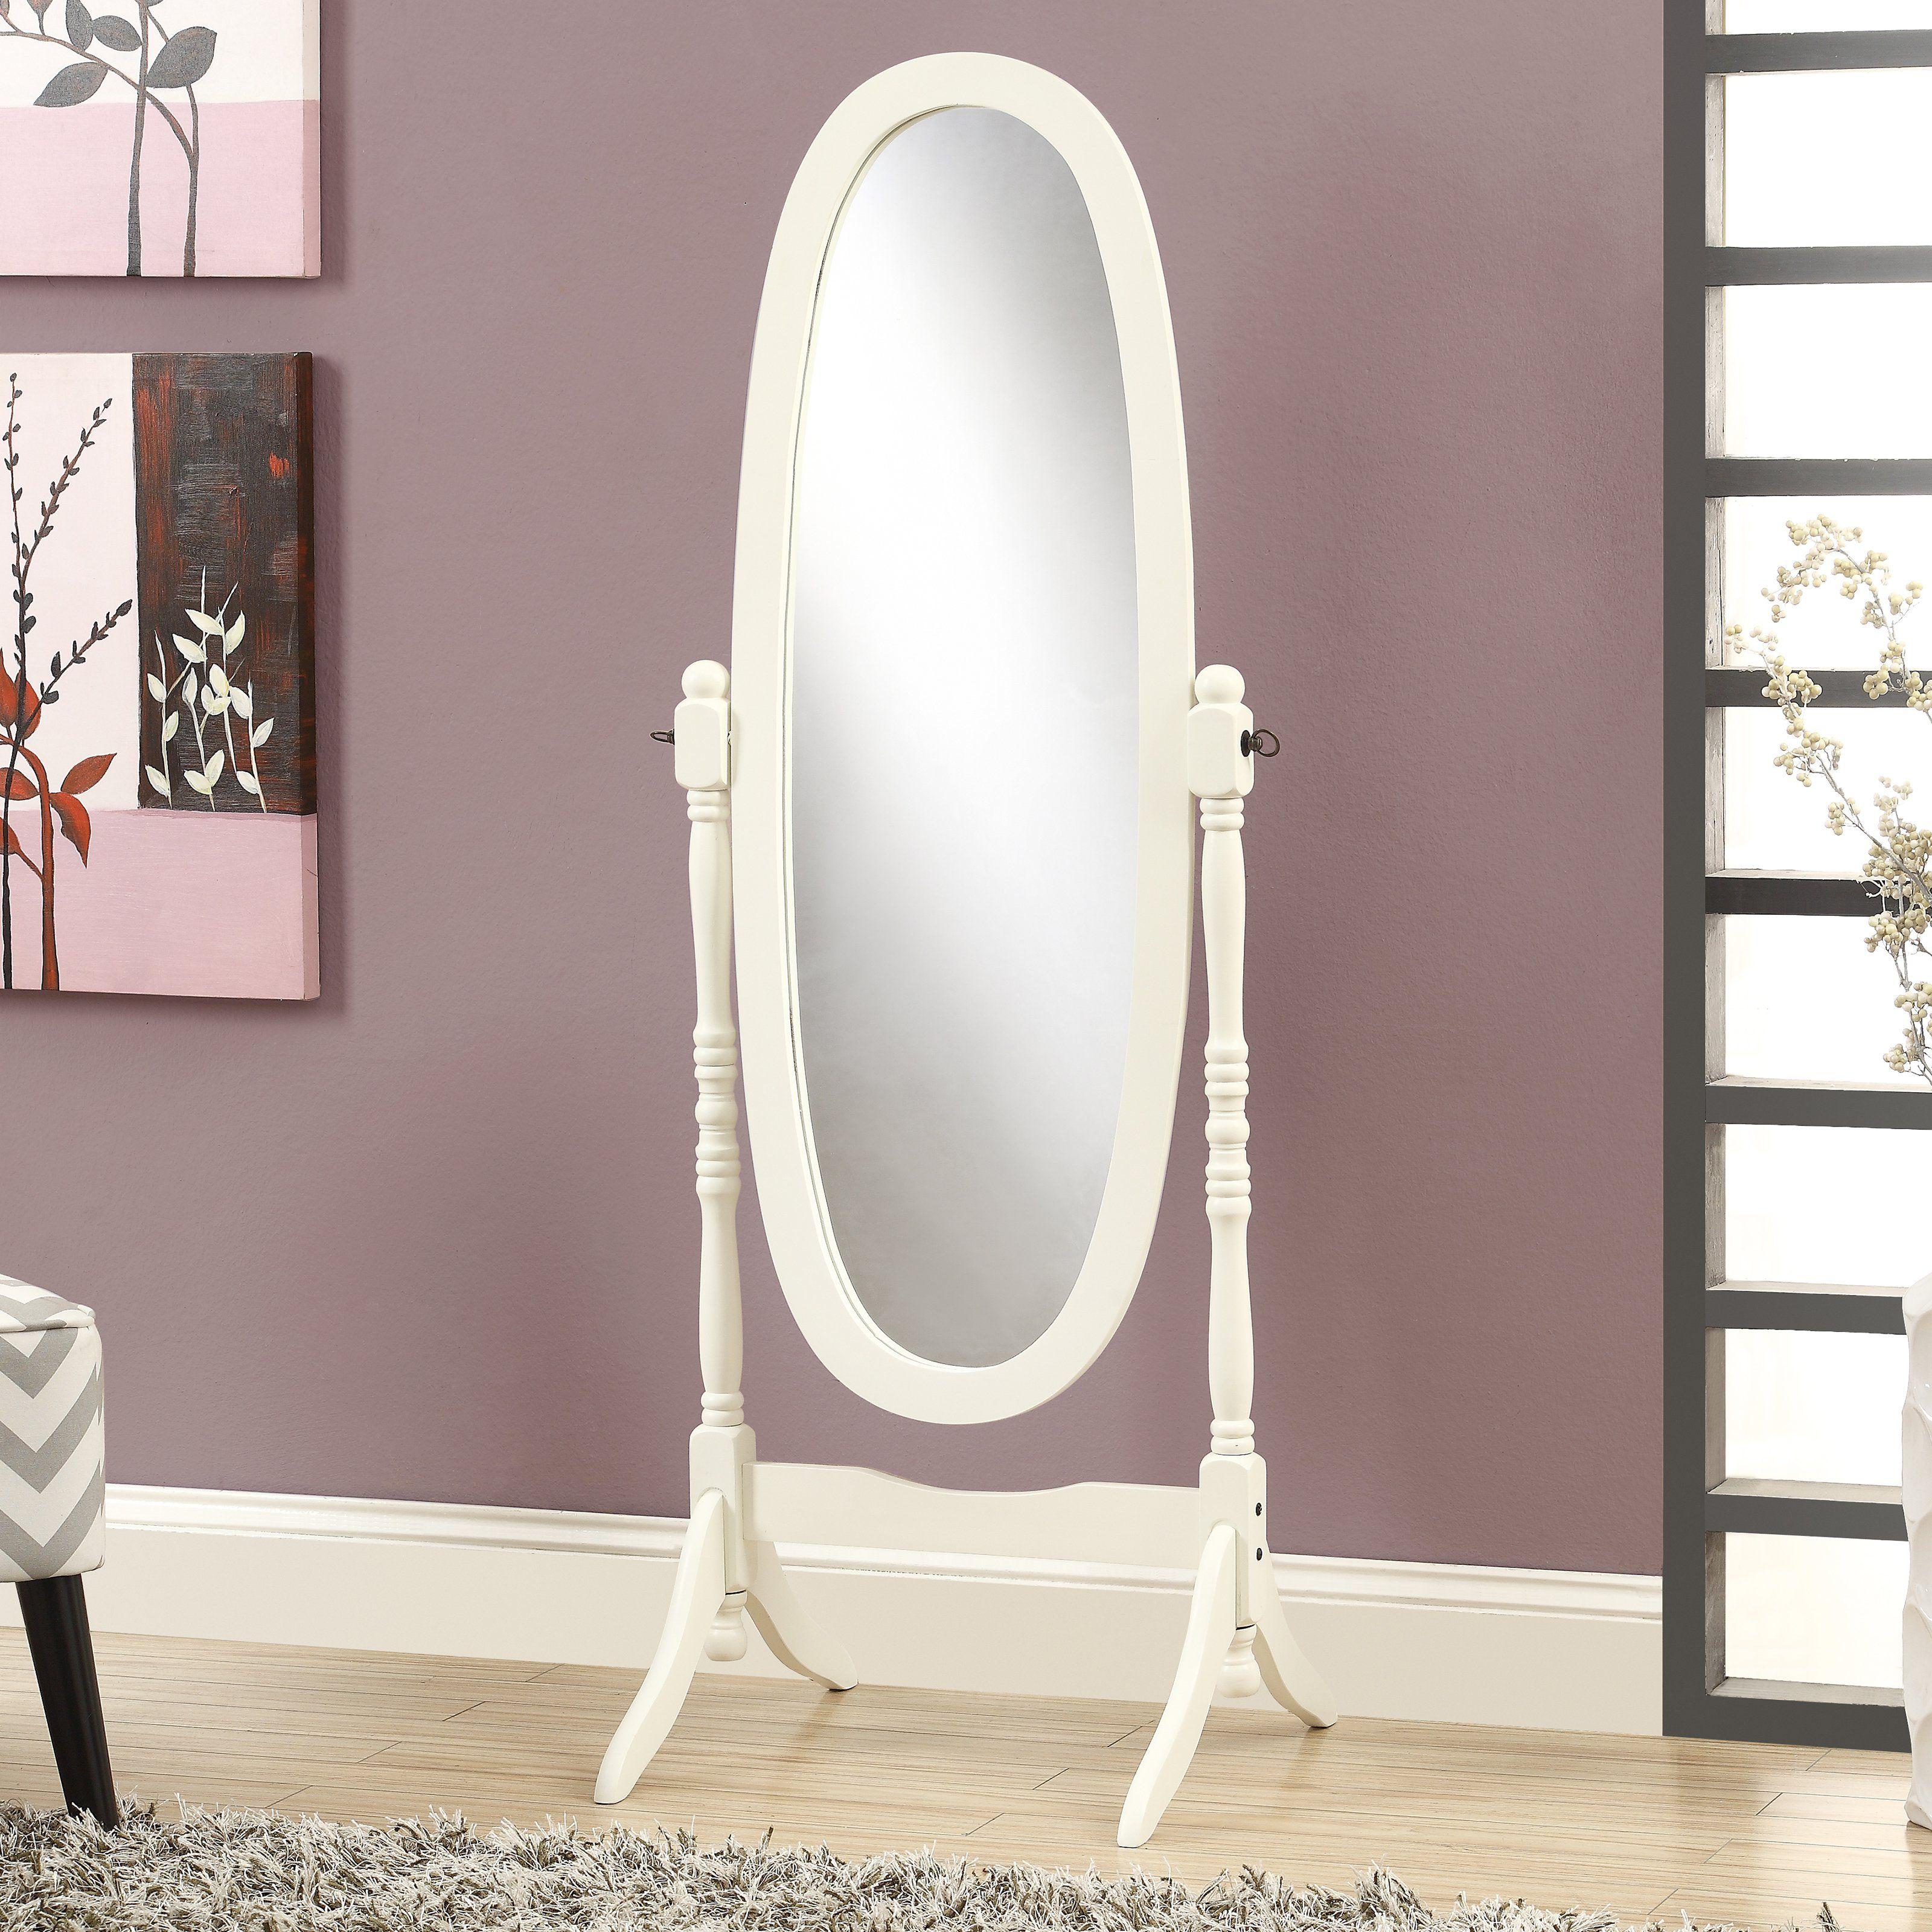 Monarch Oval Standing Mirror Floor Mirror Standing Mirror